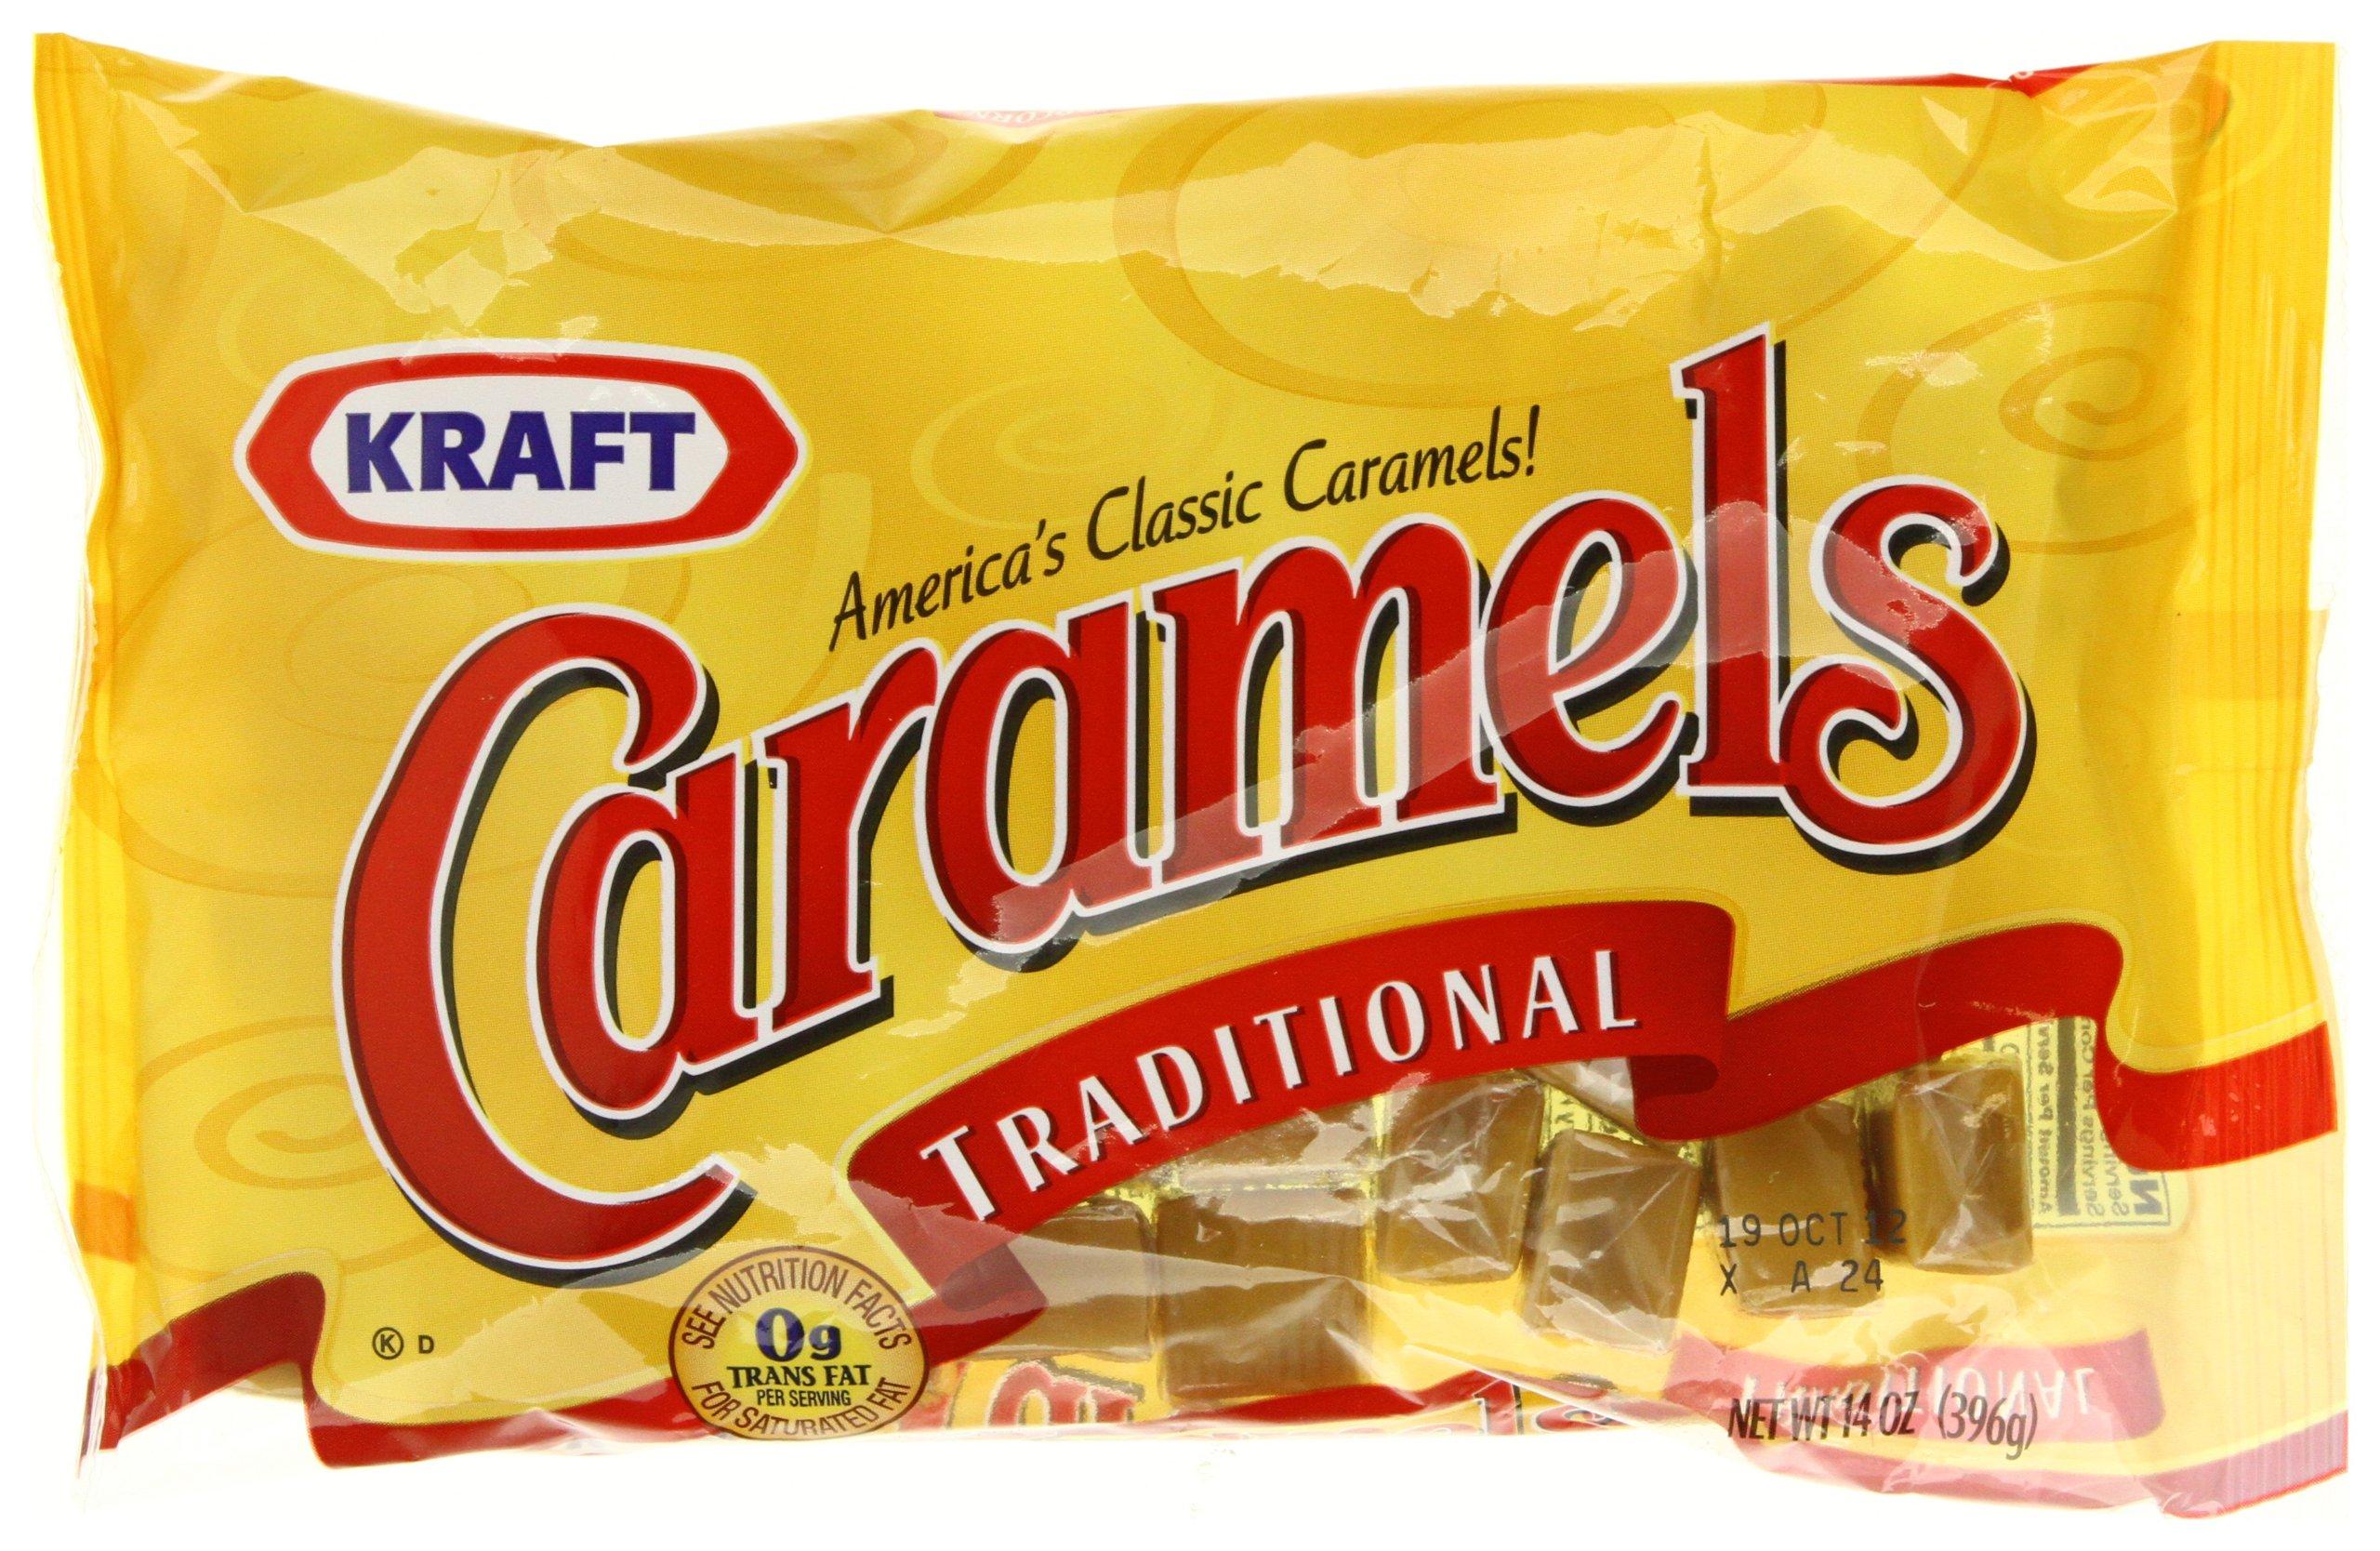 Kraft Caramels, 11-Ounce Bags (Pack of 12) by Kraft